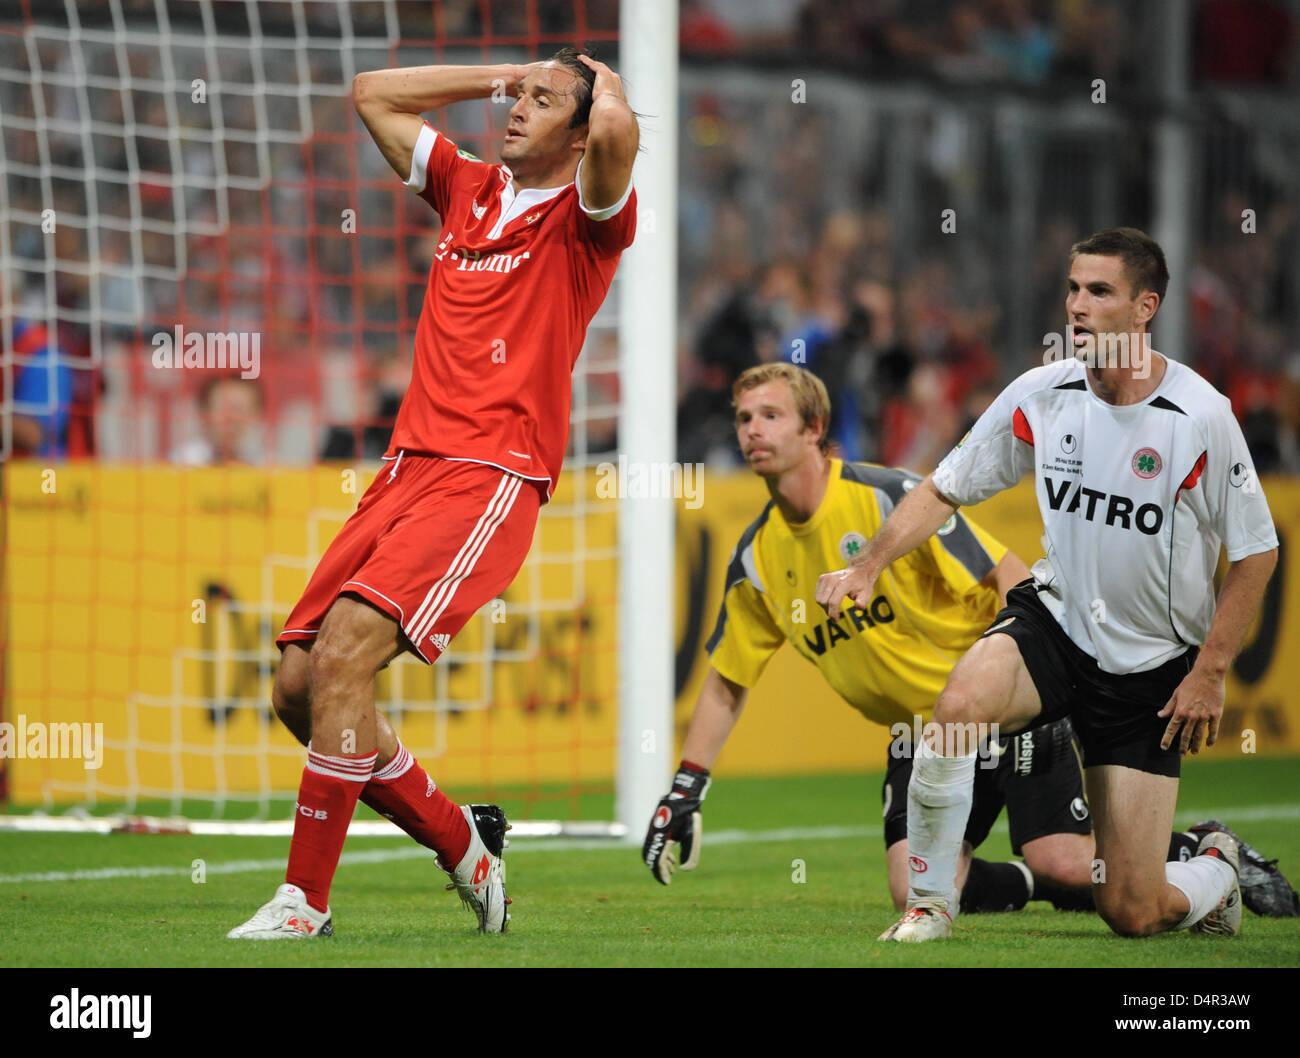 Munich?s Luca Toni (L-R) misses a chance a score next to Oberhausen?s goalkeeper Soeren Pirson and Thomas Schlieter - Stock Image